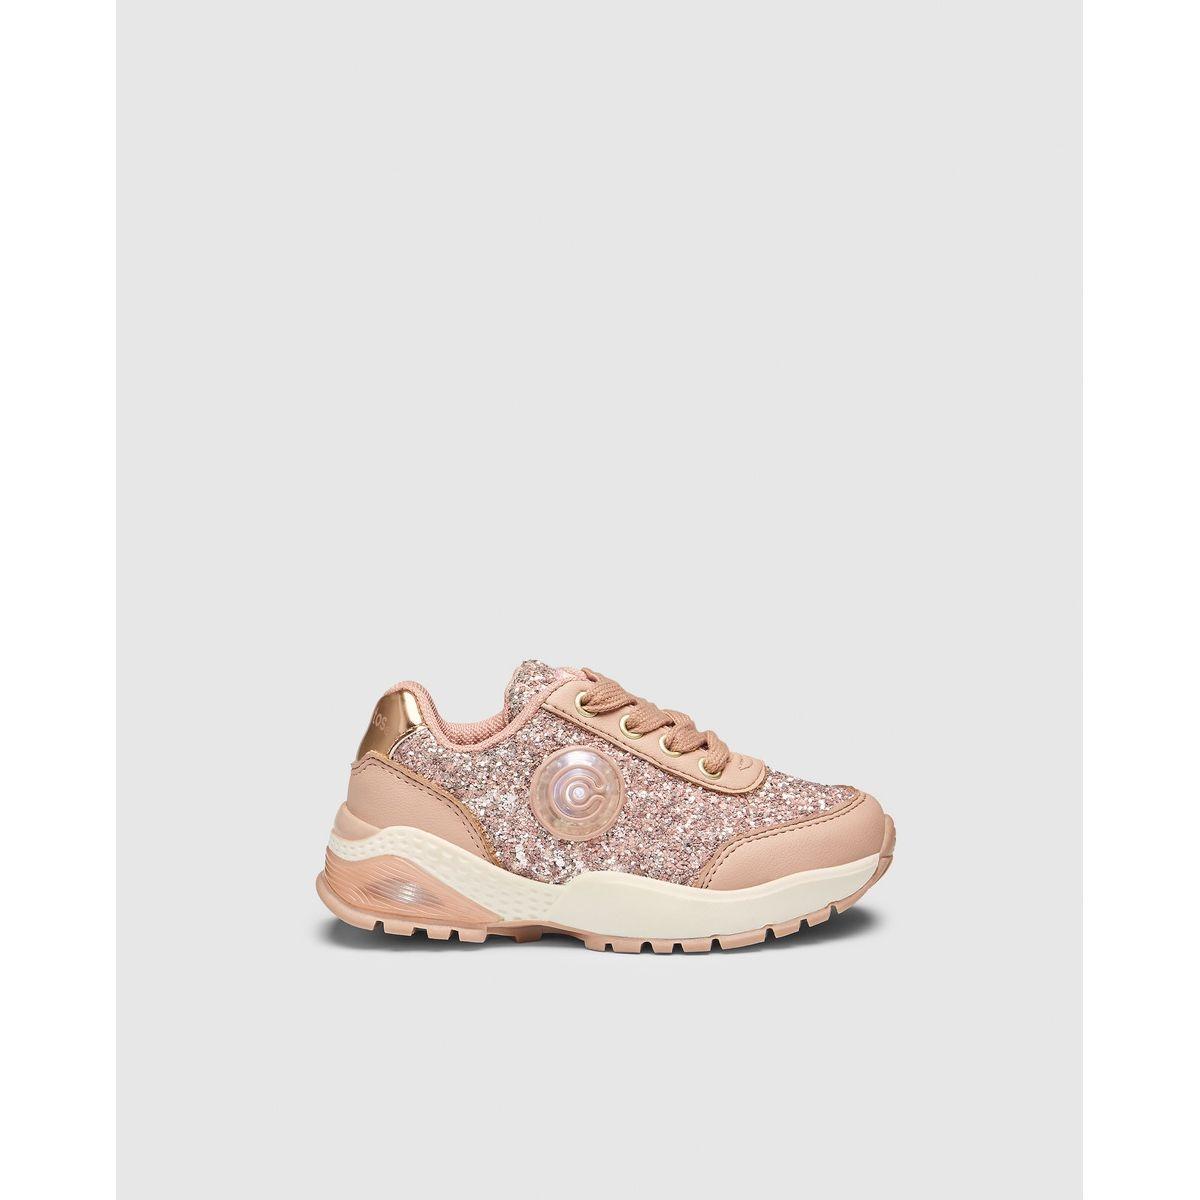 Chaussures sport led  glitter